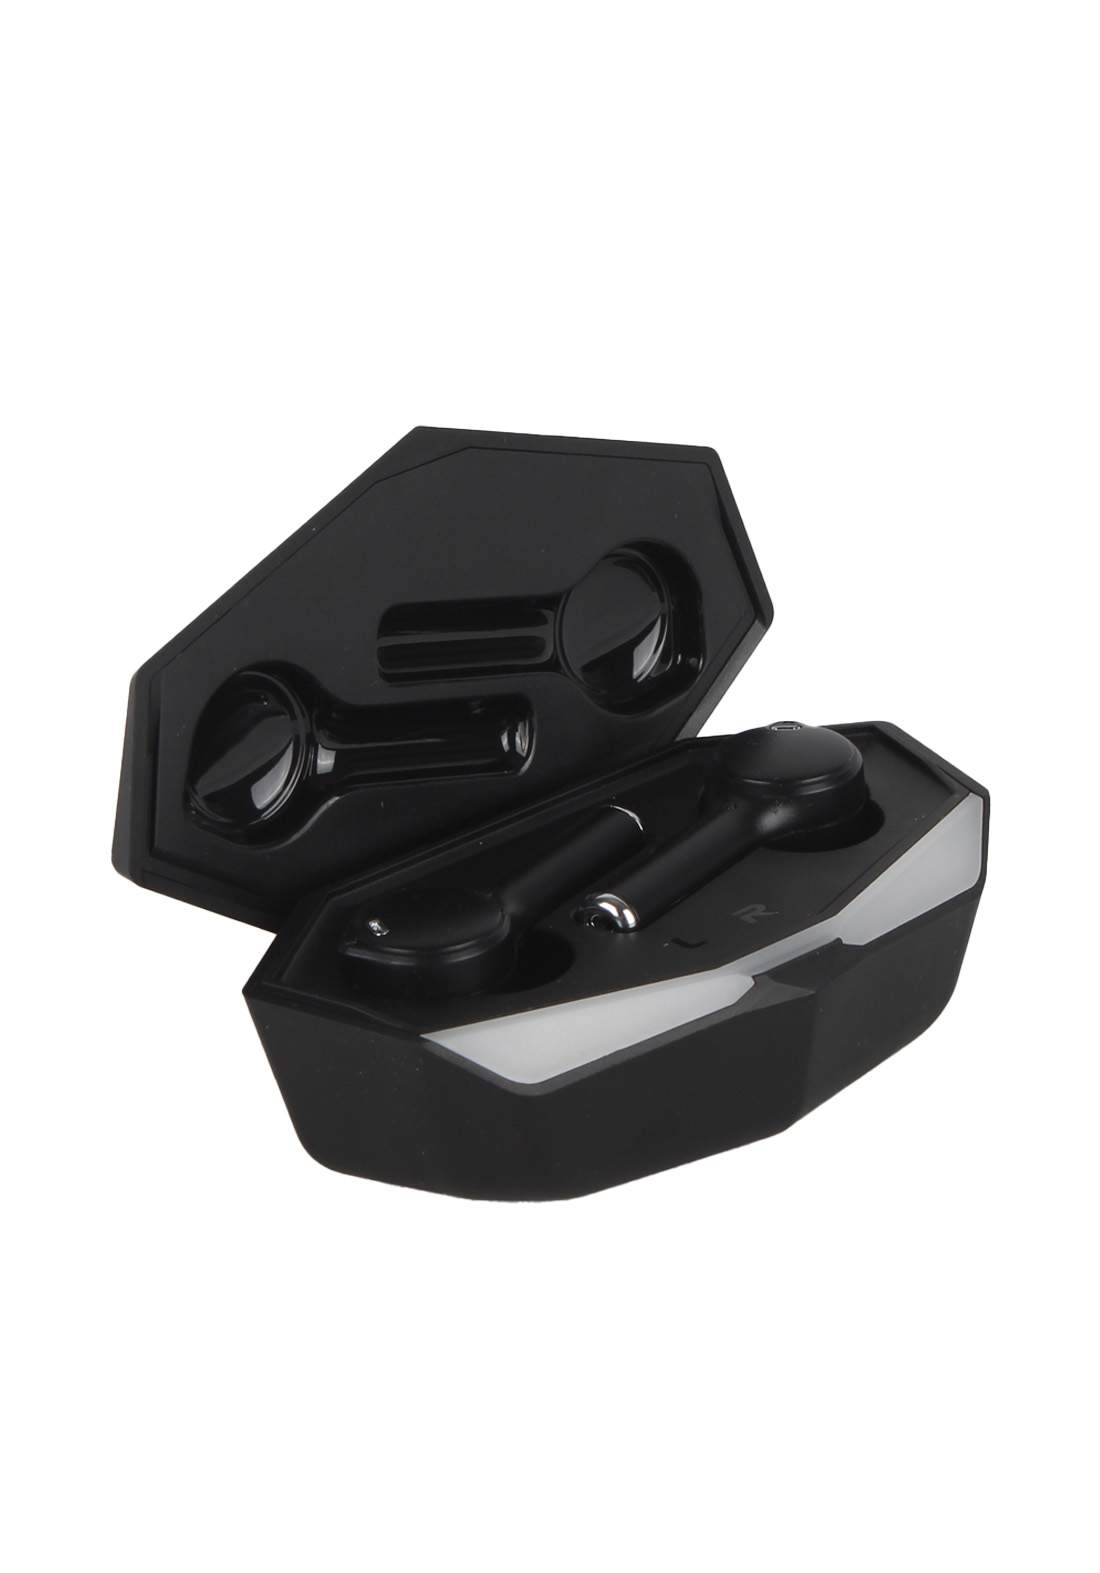 Ture N8G Wireless Gaming Headset - Black سماعة لاسلكية